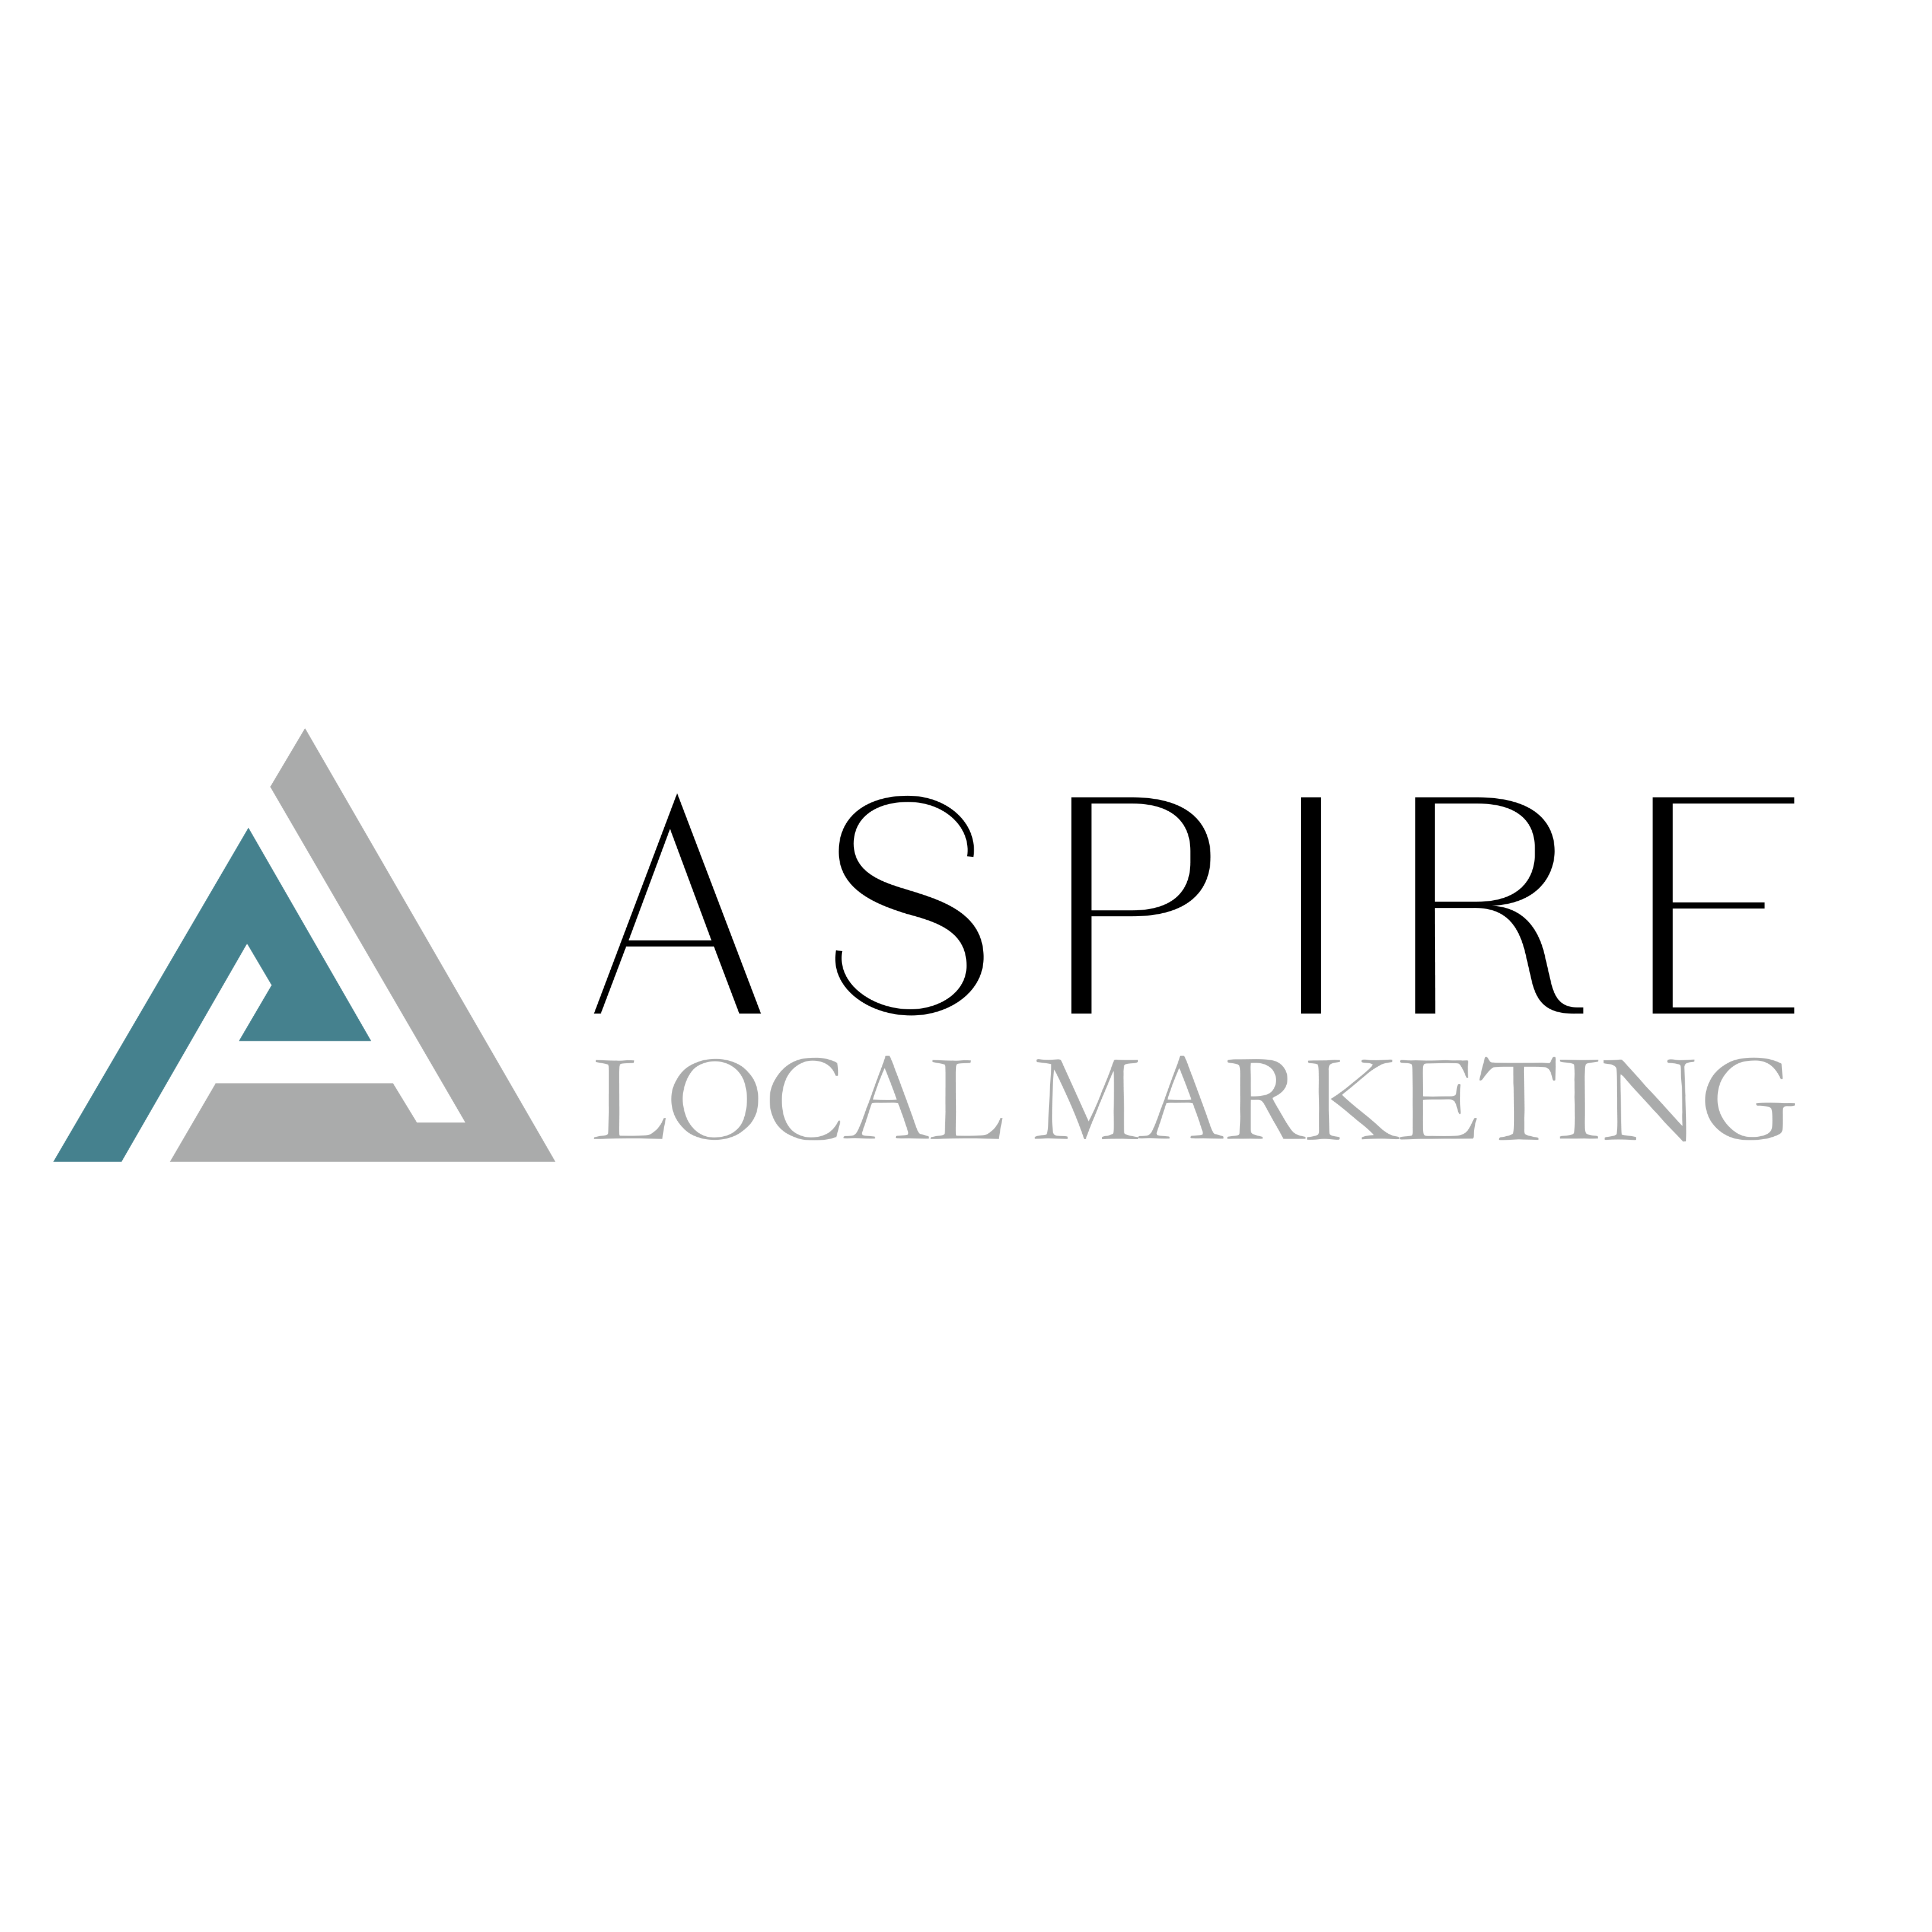 Aspire Local Marketing